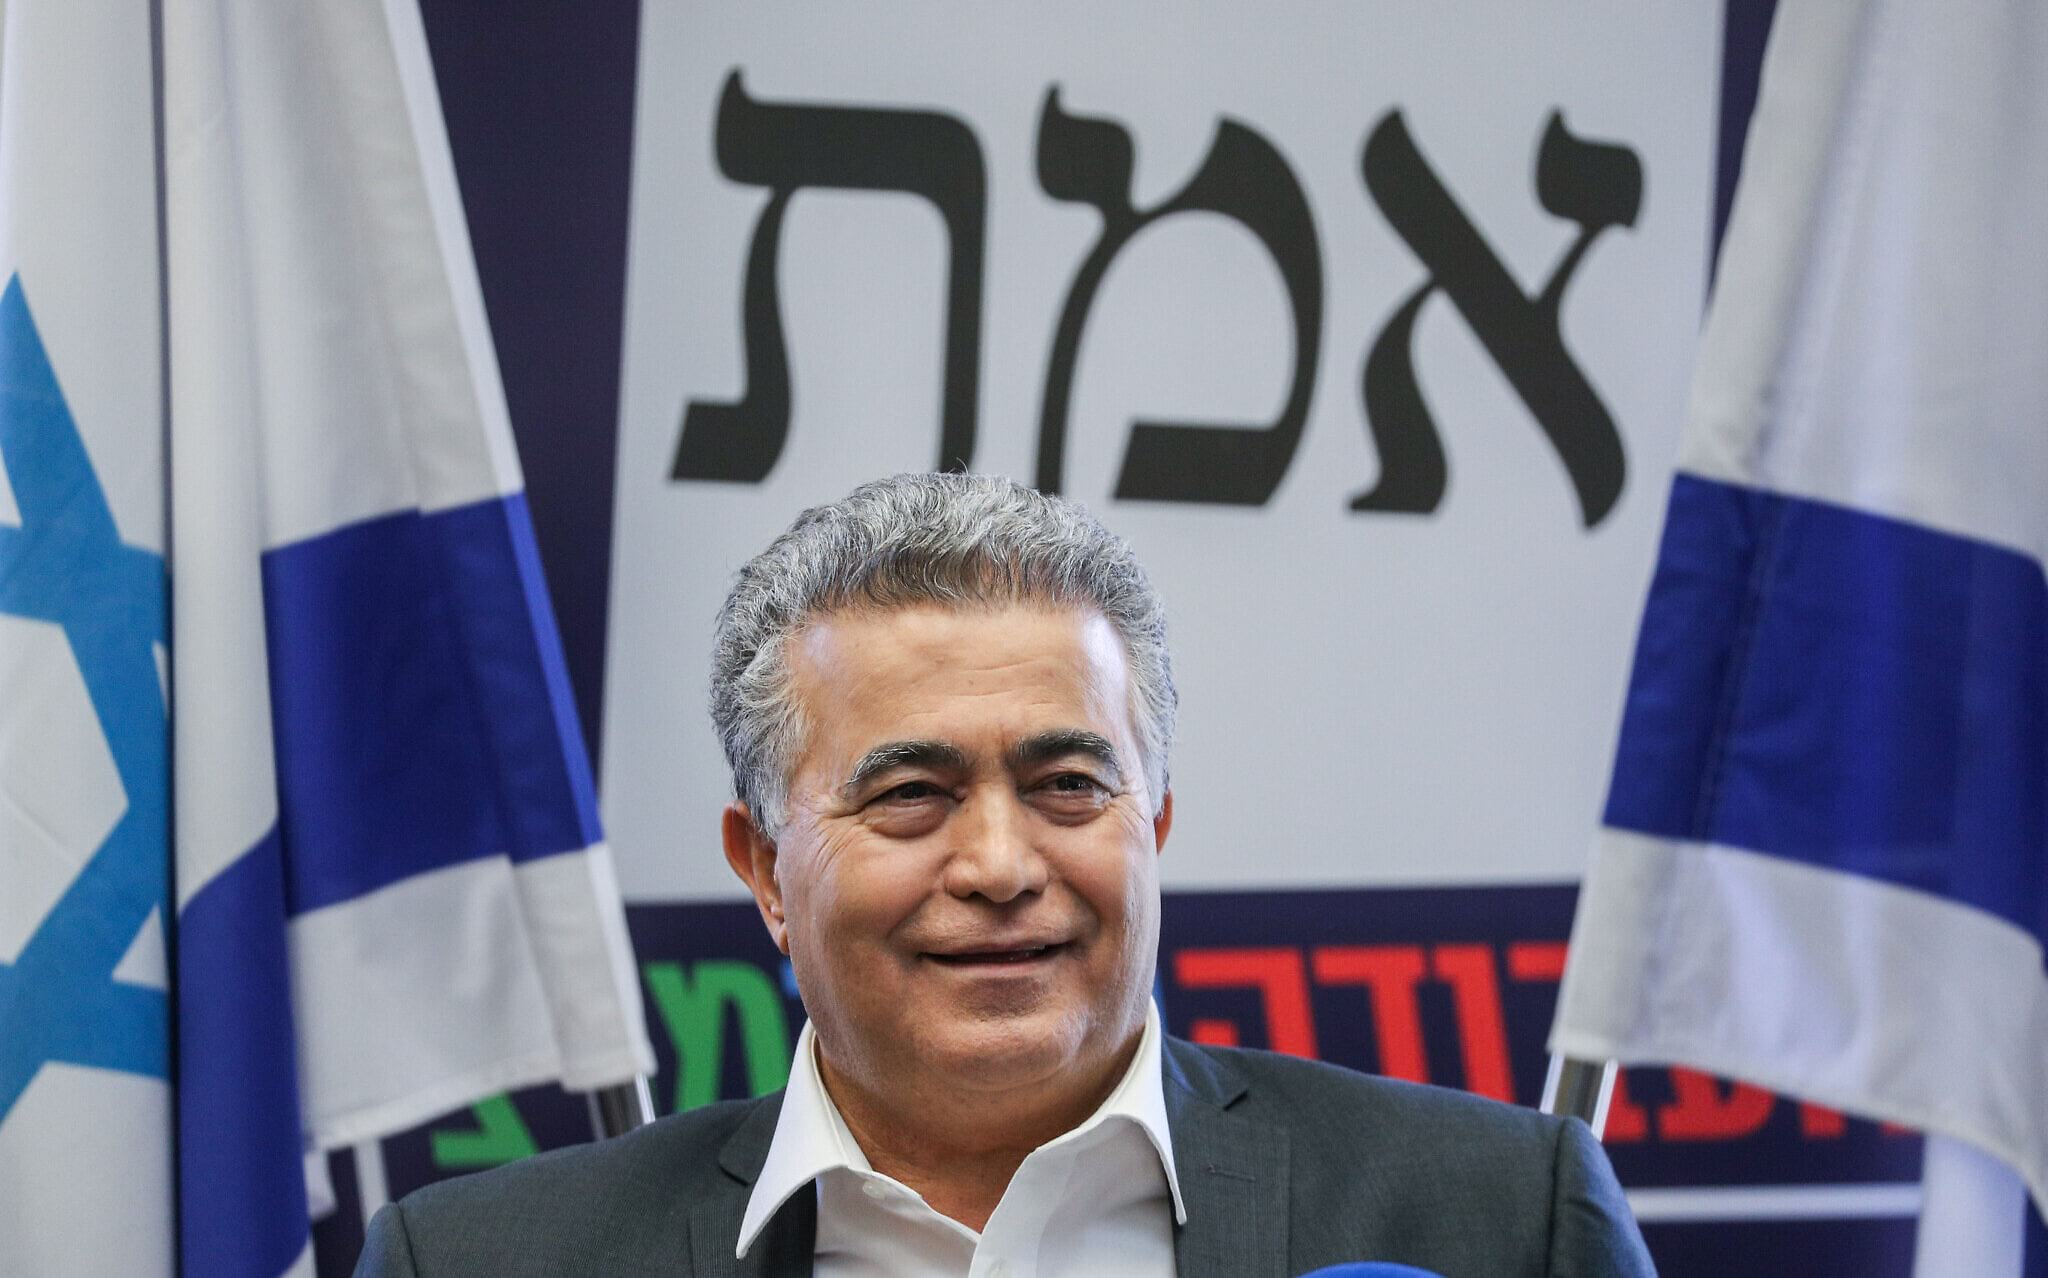 Lider Avody Amir Perets